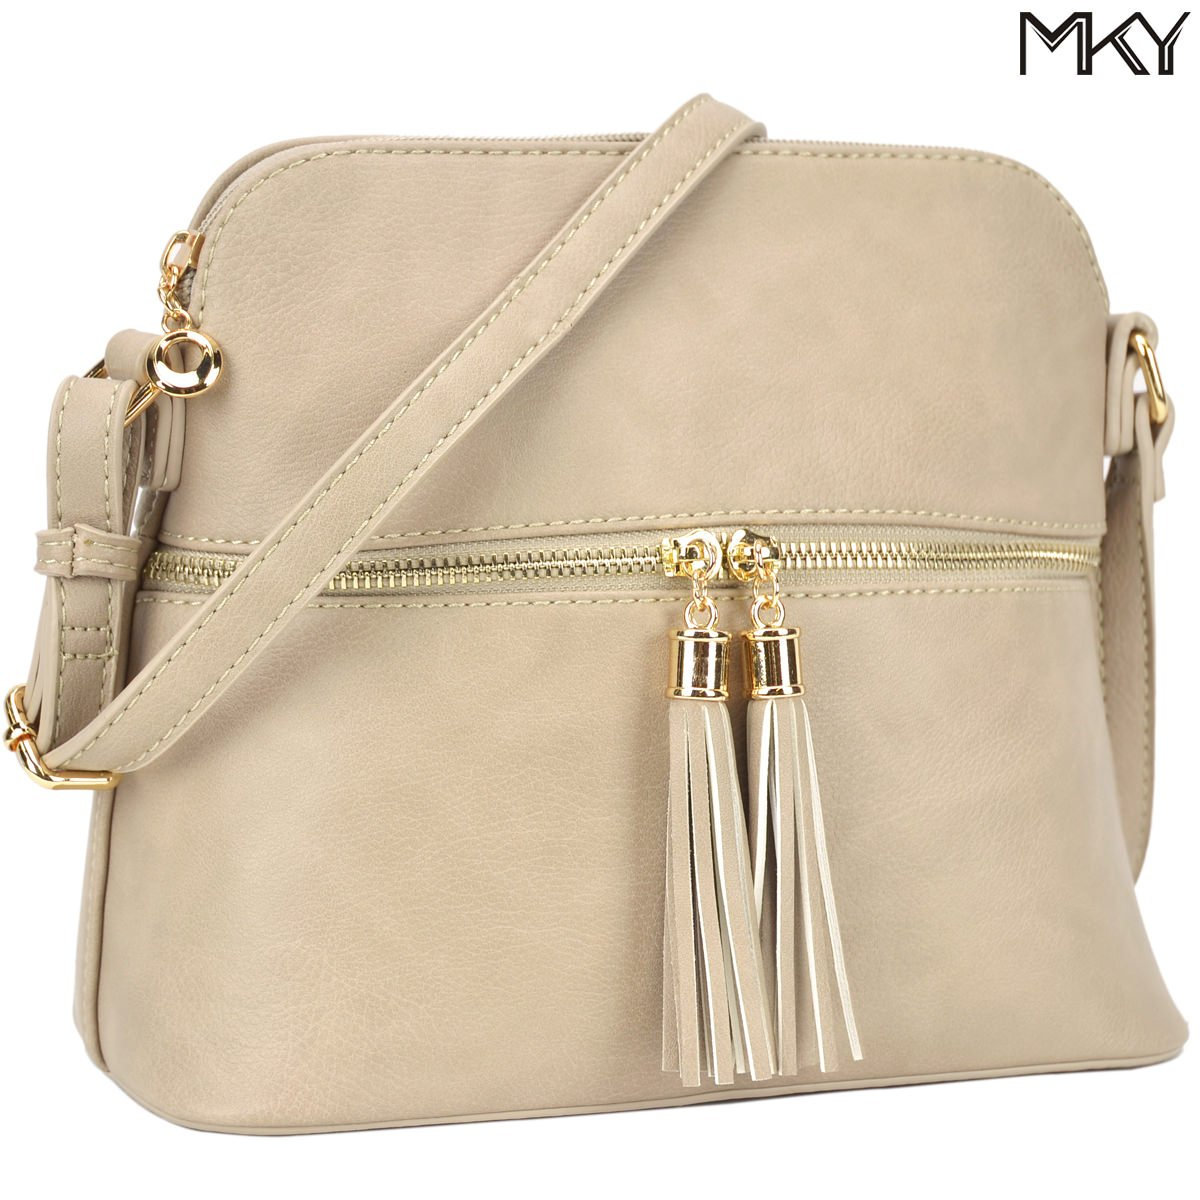 Ladies PU Leather Medium Crossbody Shoulder Bag Fashion Purse Large Capacity Tassel Beige